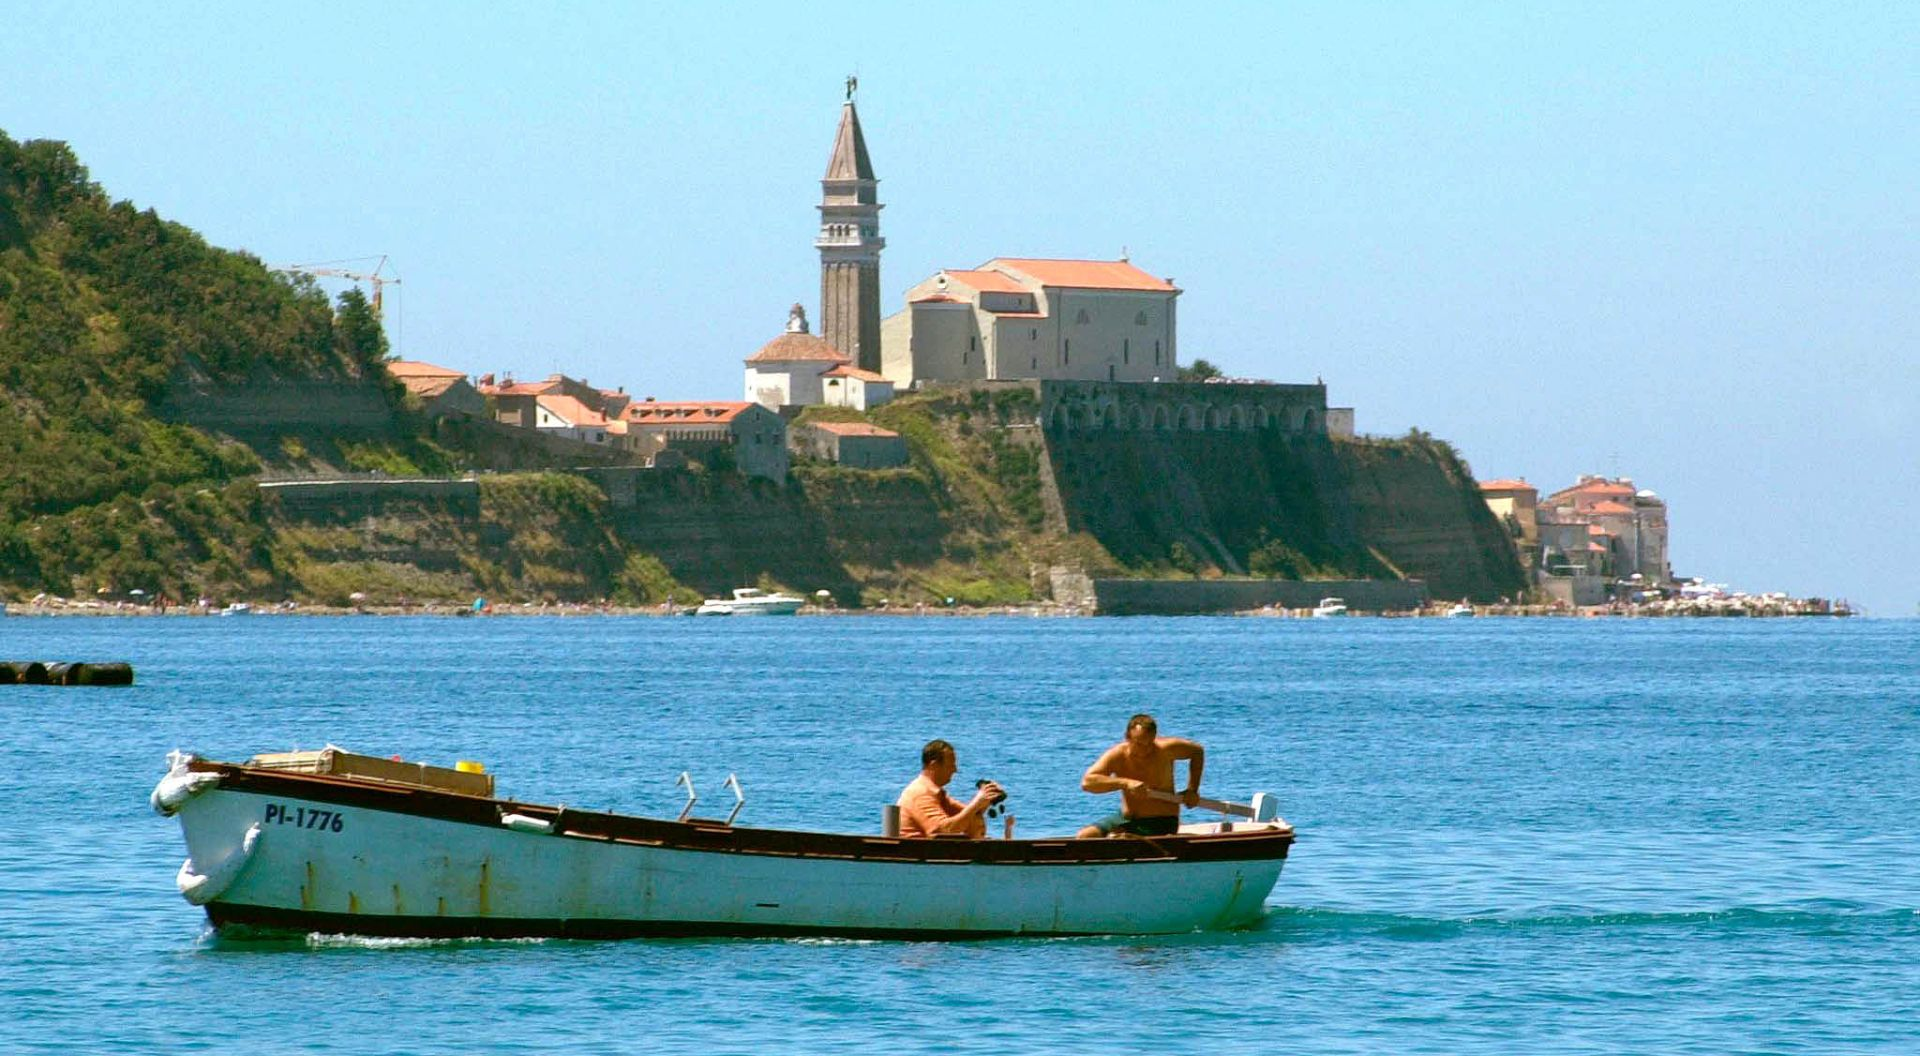 Slovenski ribari dobili prve platne naloge iz Hrvatske